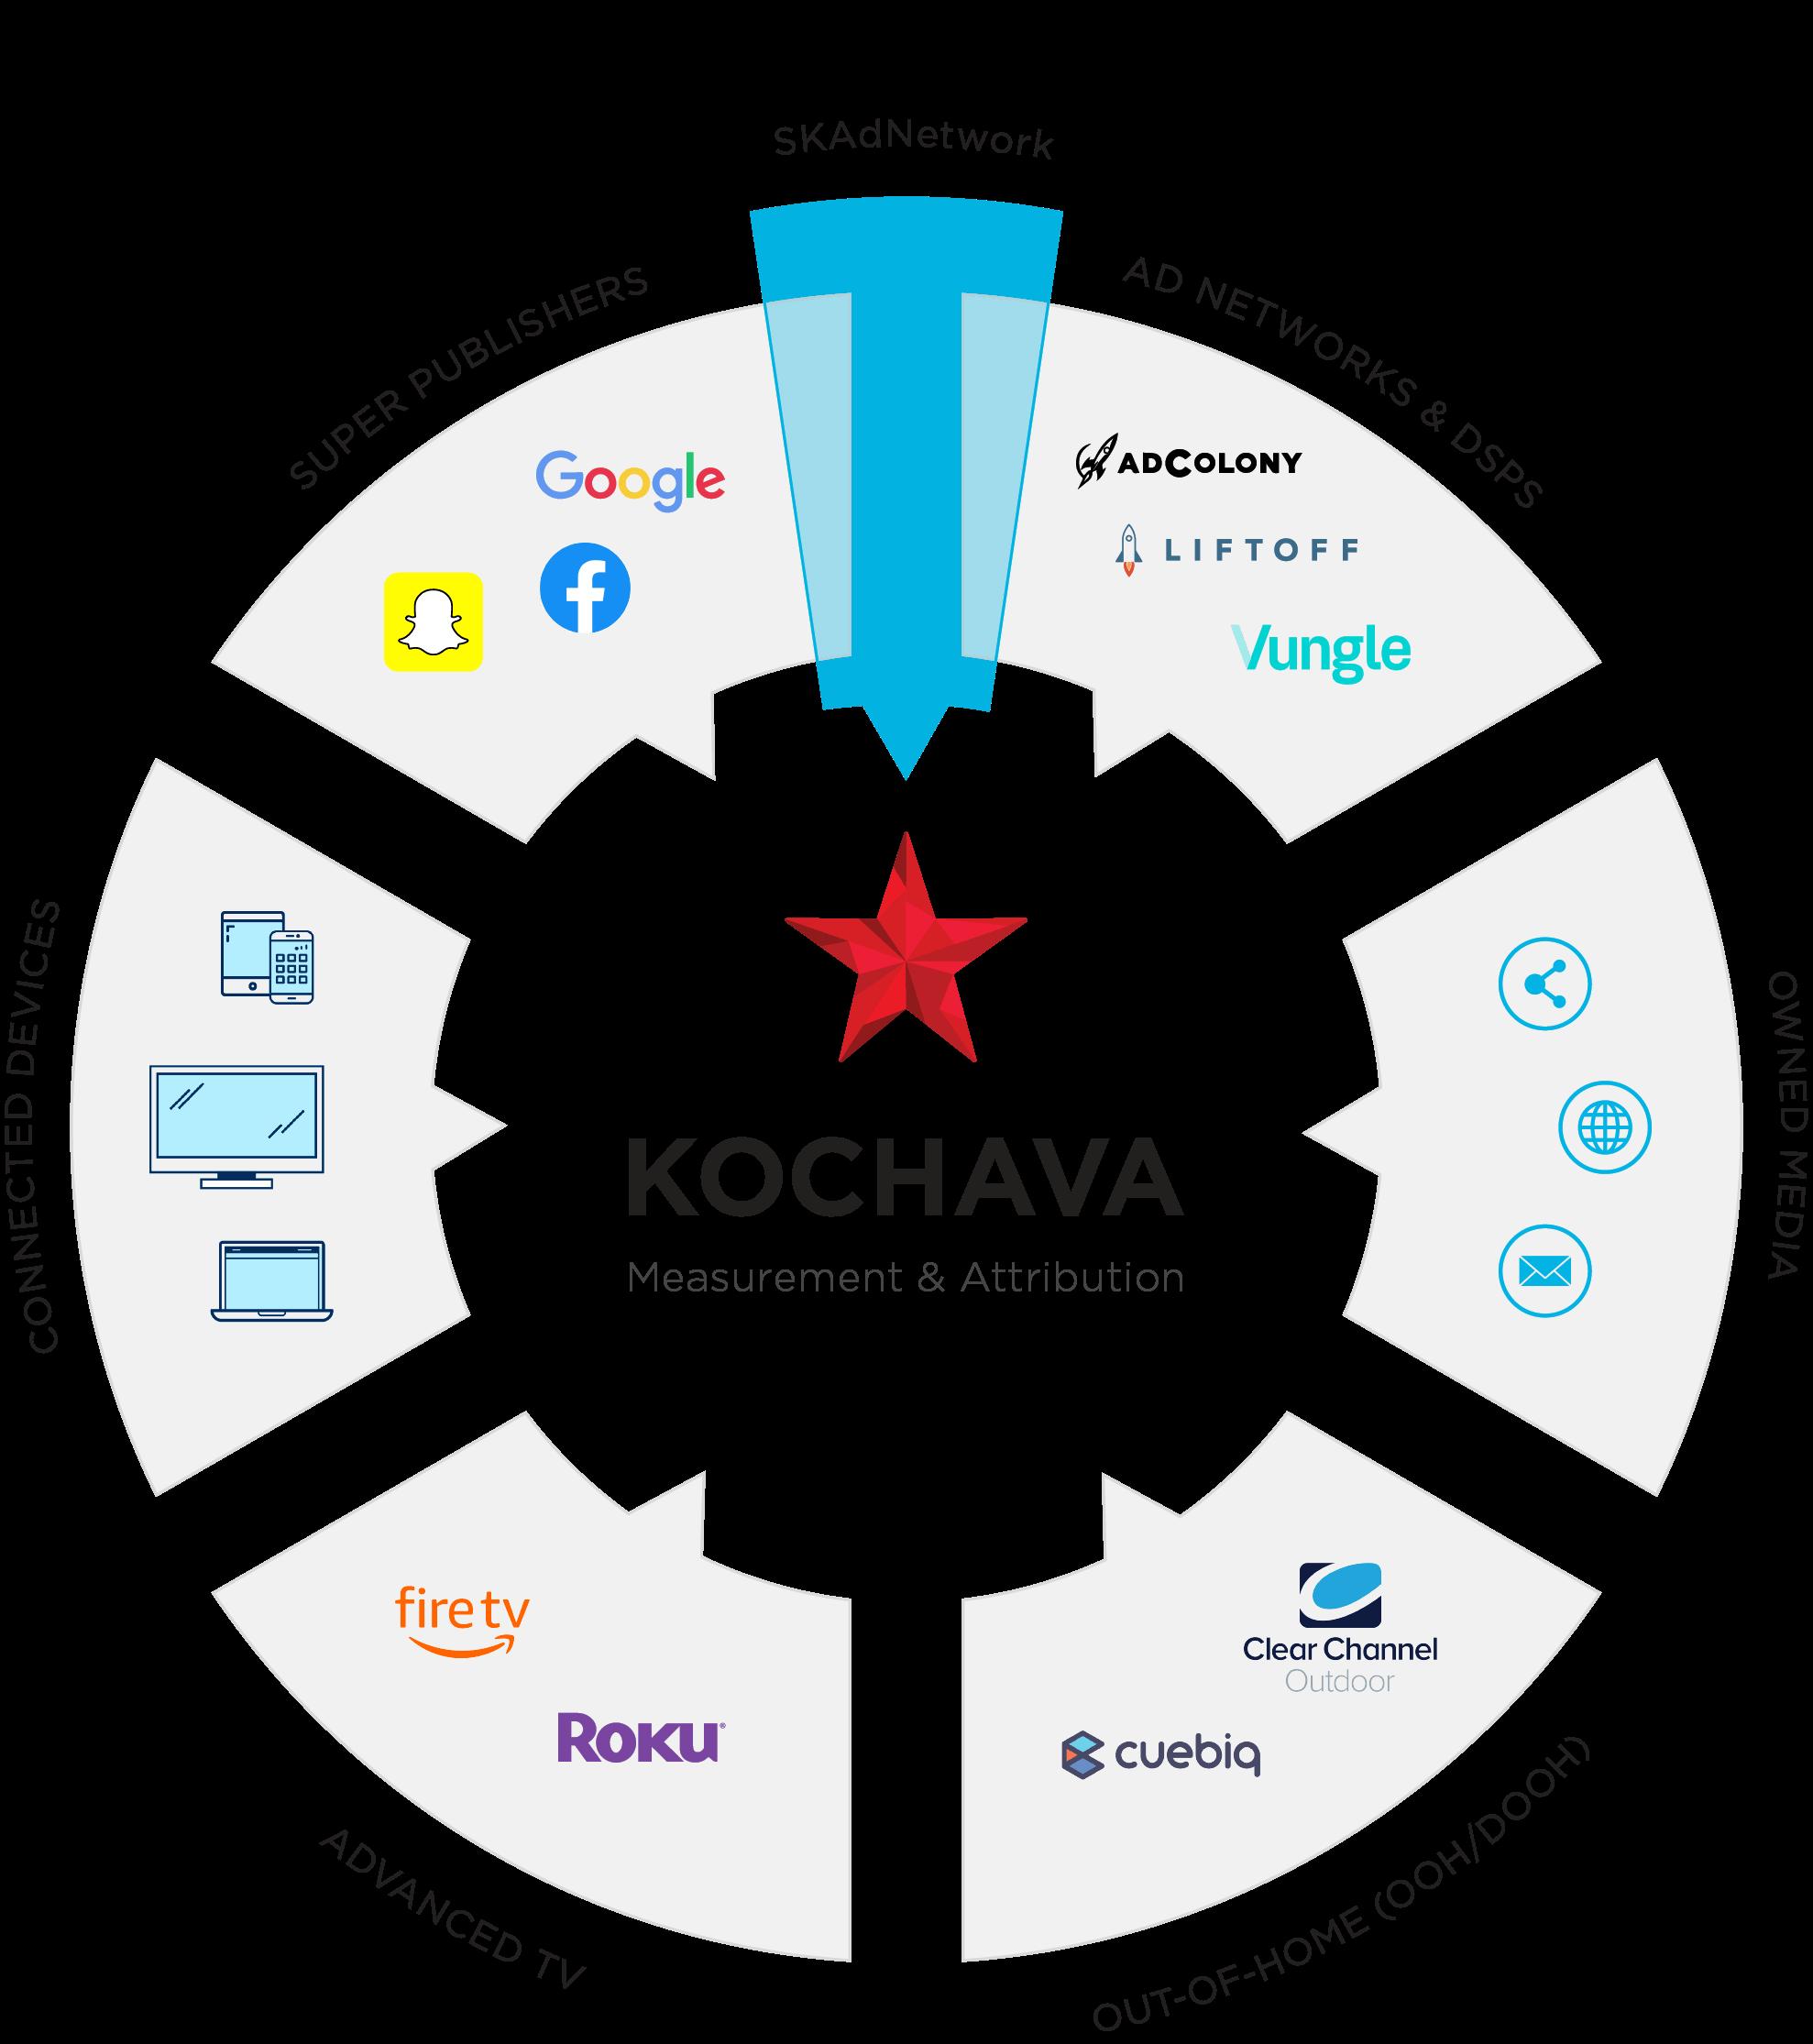 Kochava omni-channel and SKAdNetwork solution graphic